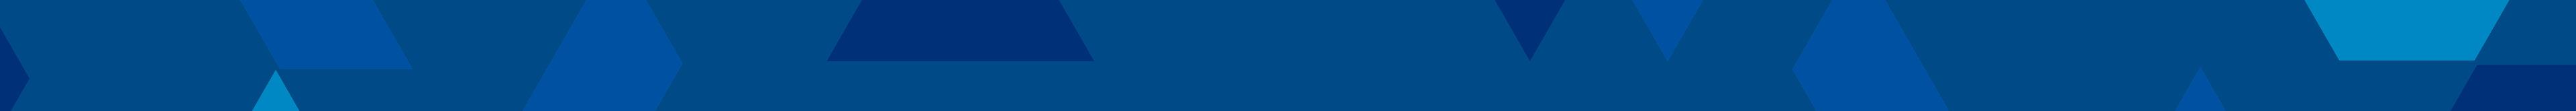 Nordic-Pattern-Banner-(9)